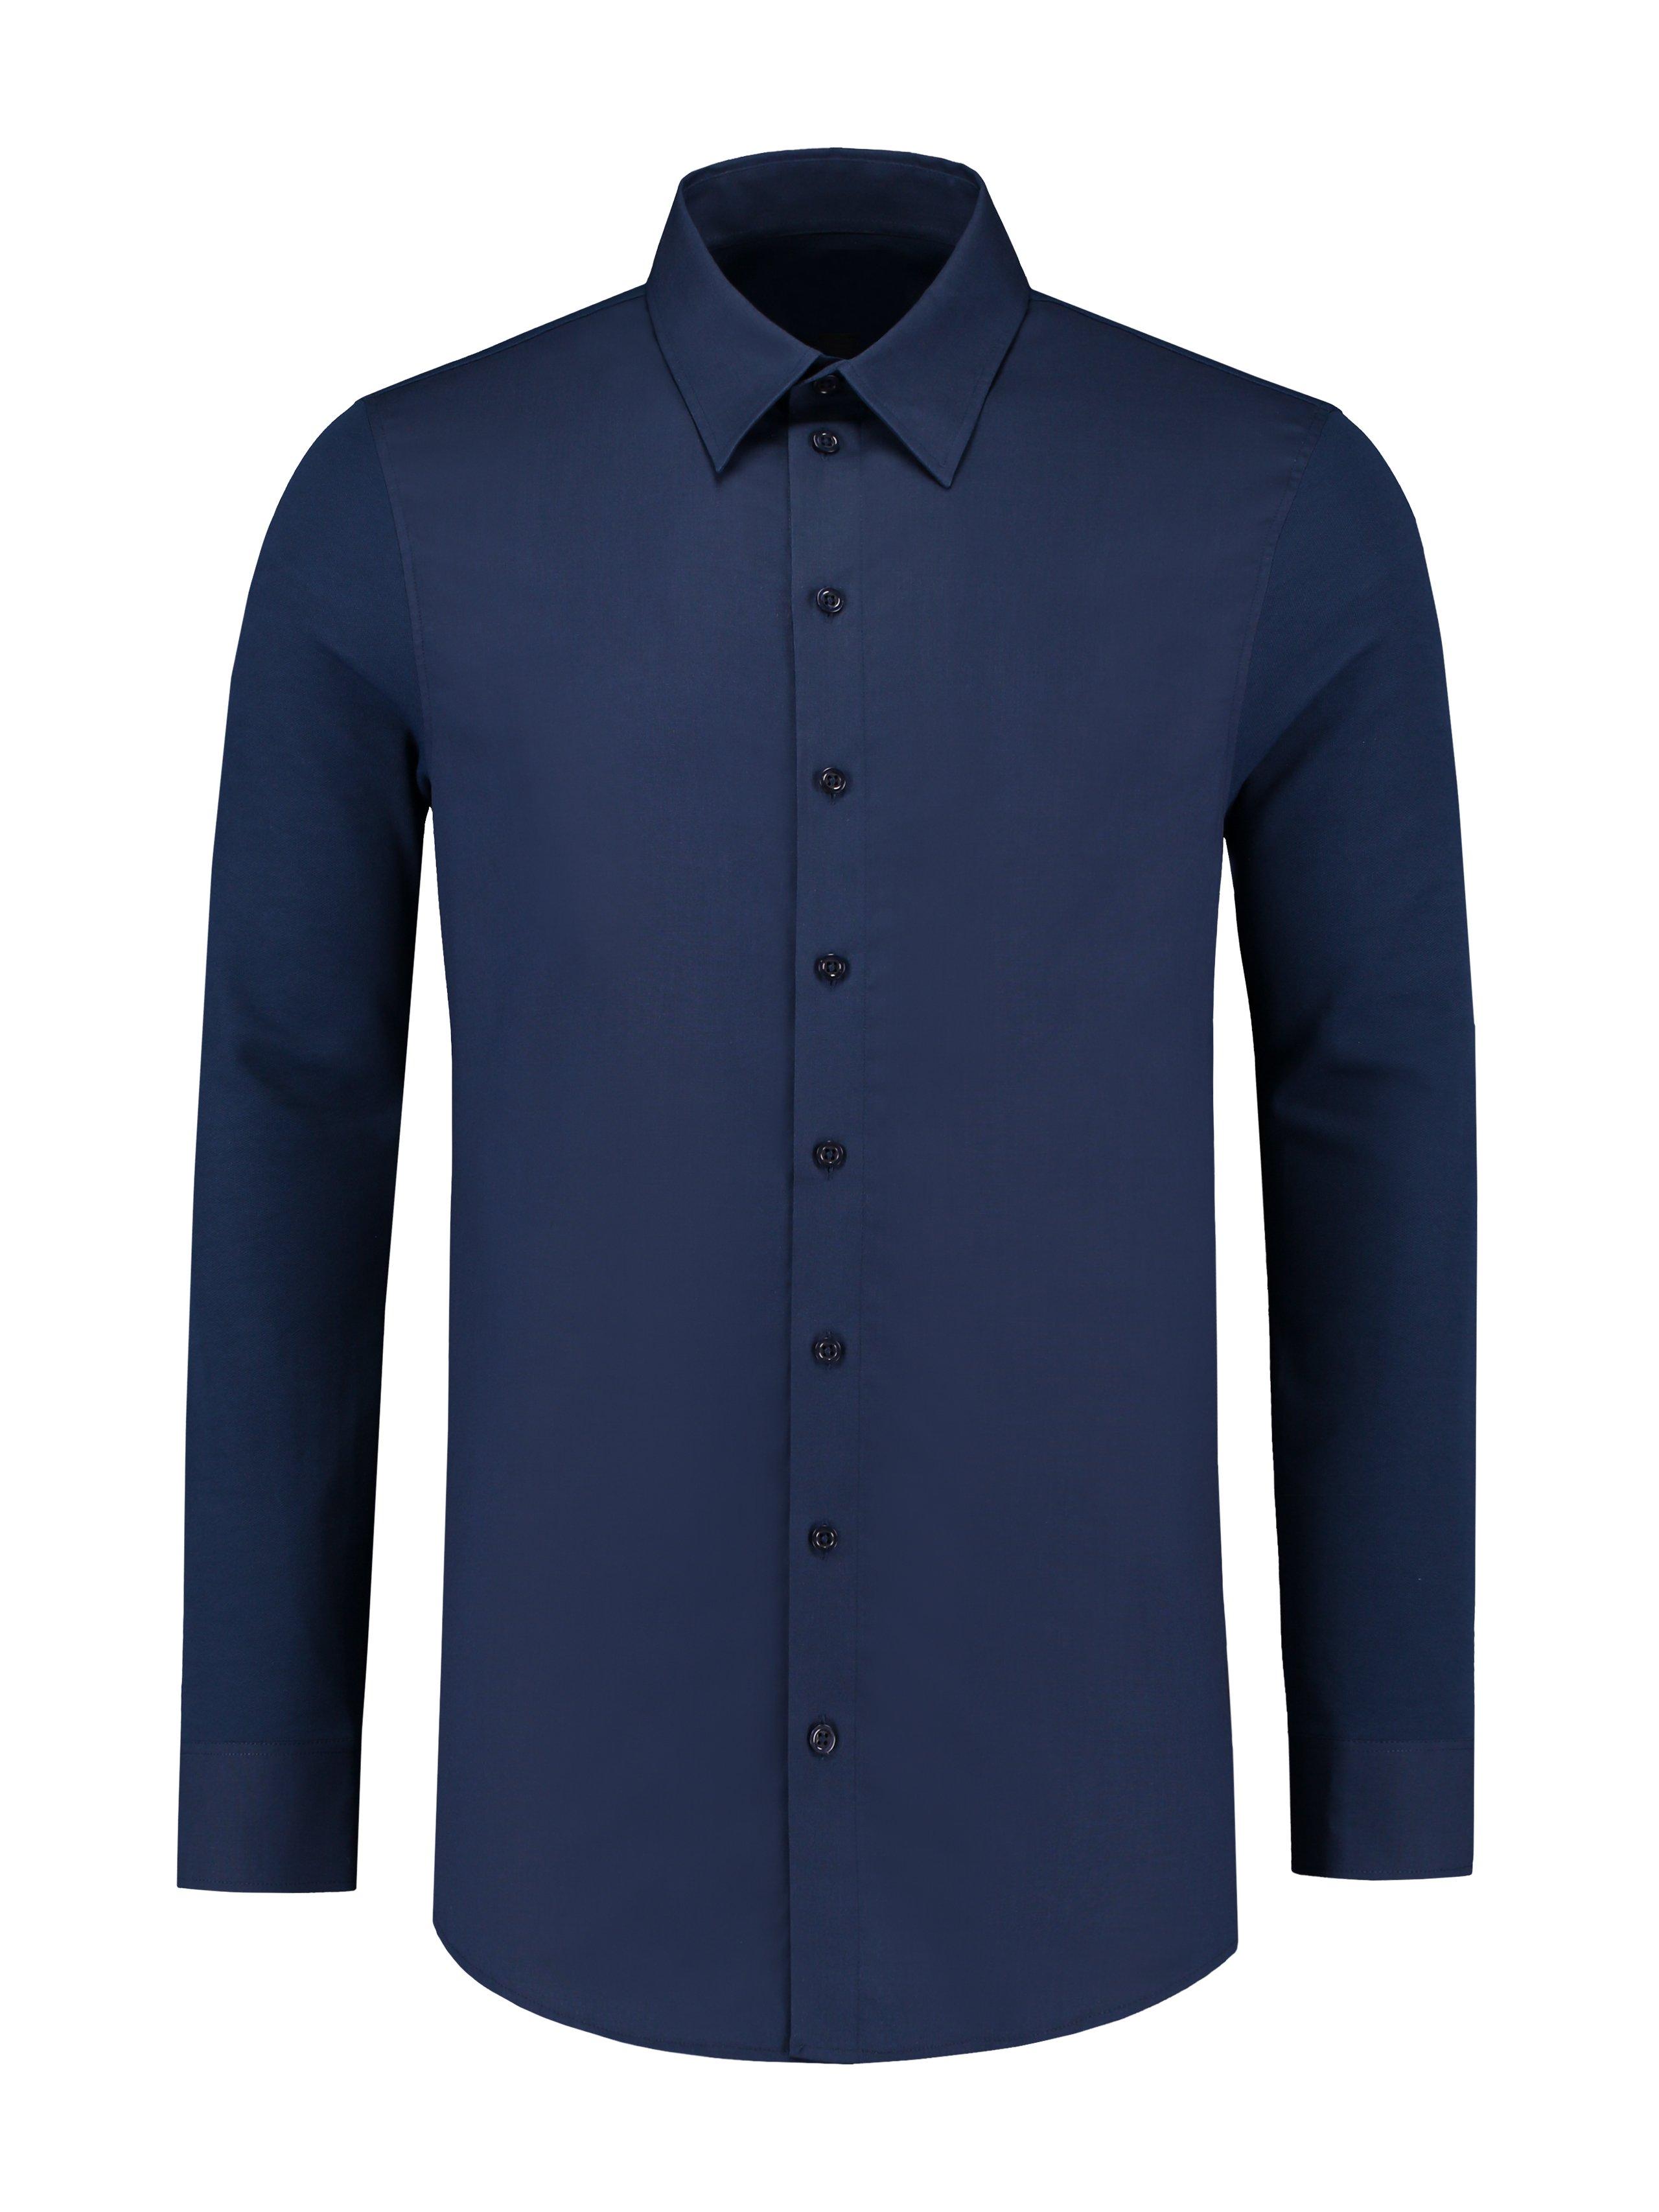 Service Shirt Jesse Patriot Blue